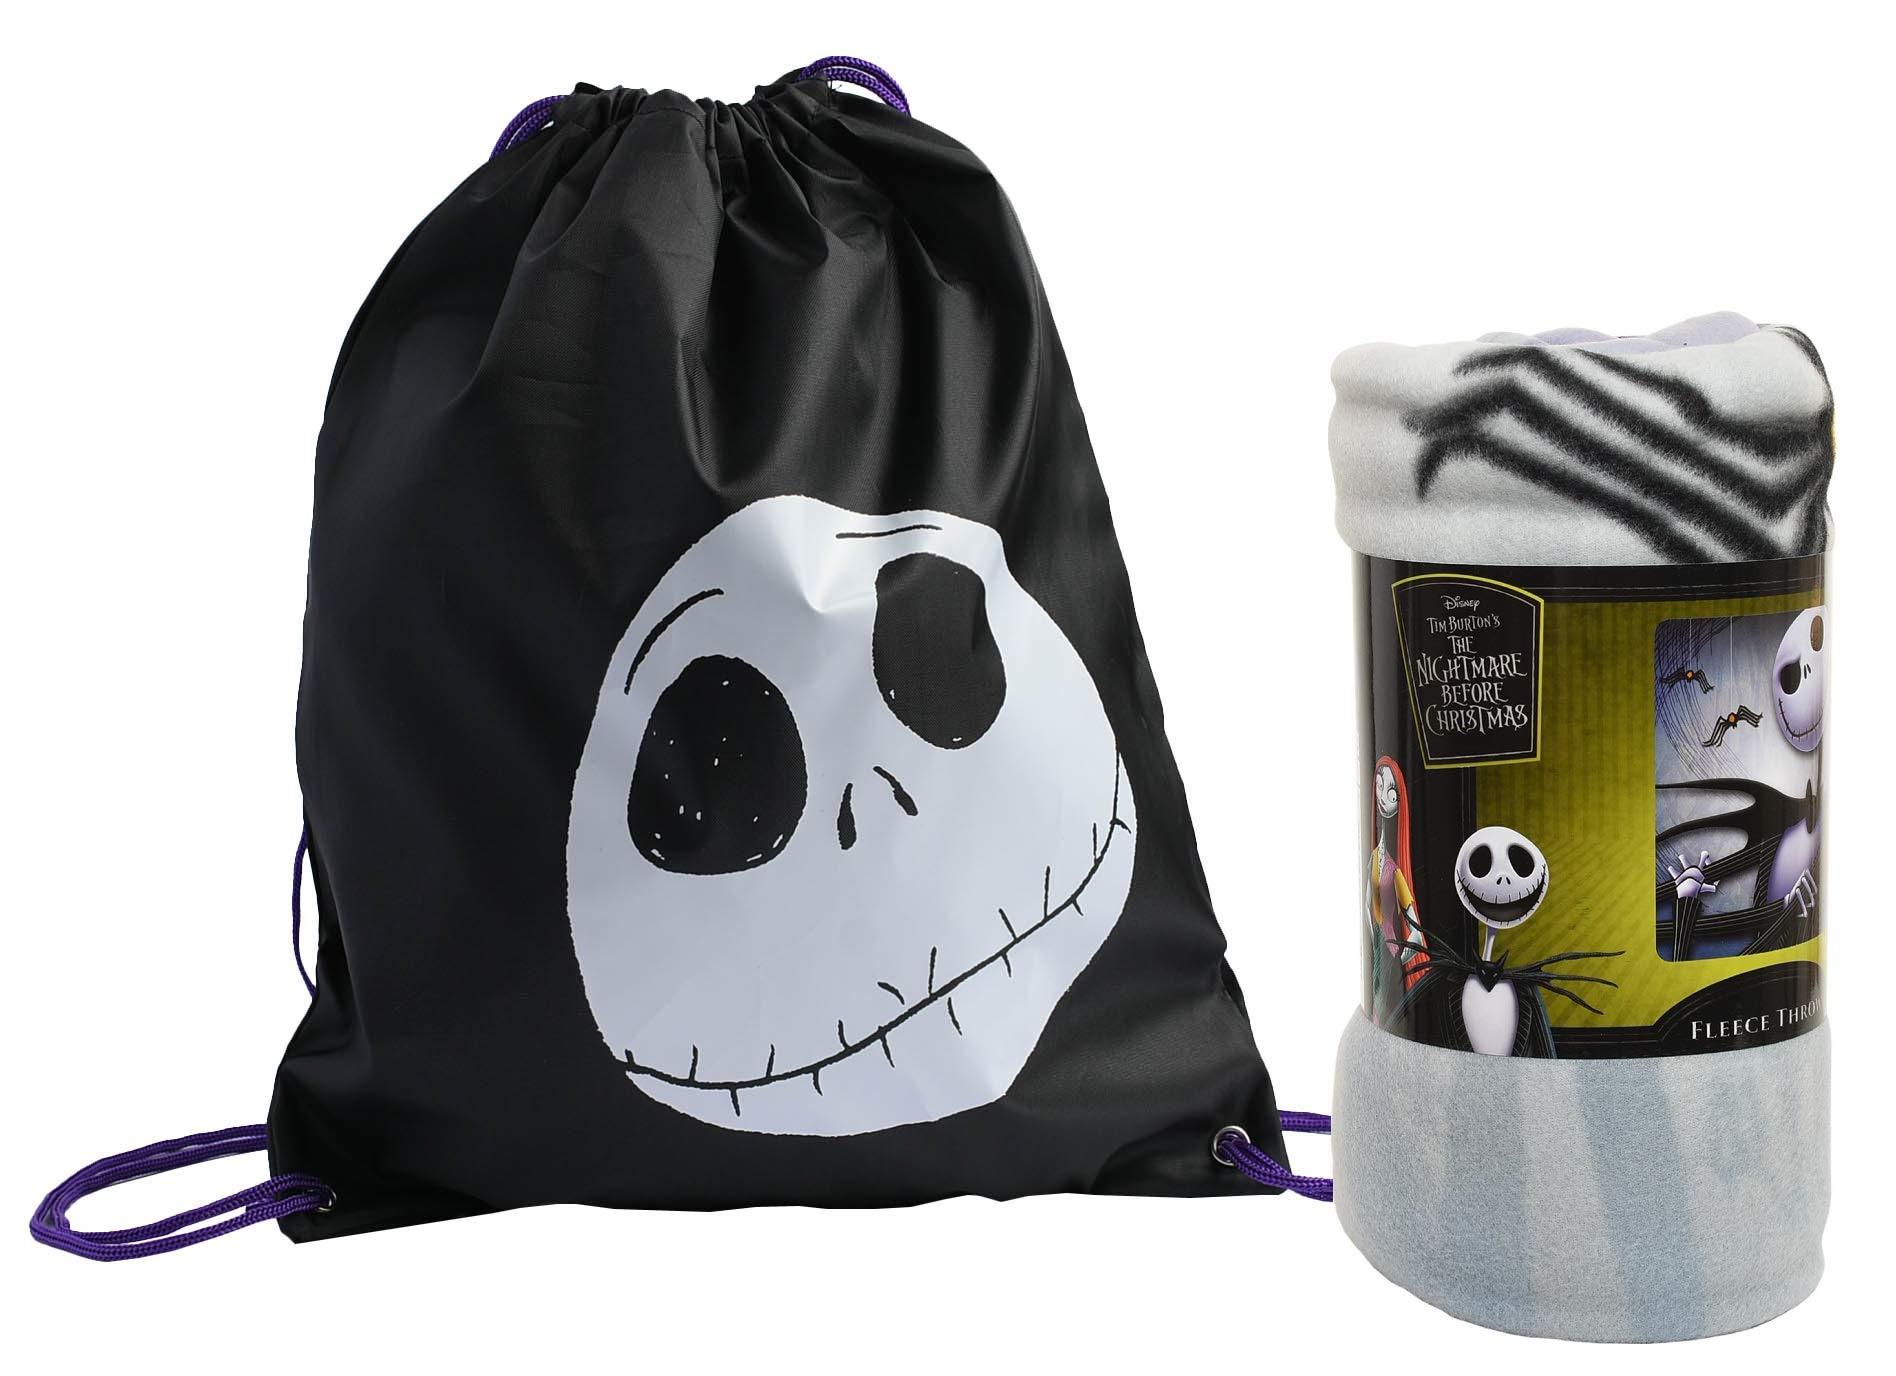 Disney / Northwest Nightmare Before Christmas Throw Blanket & Sling Bag - 2 pc Set by Disney / Northwest